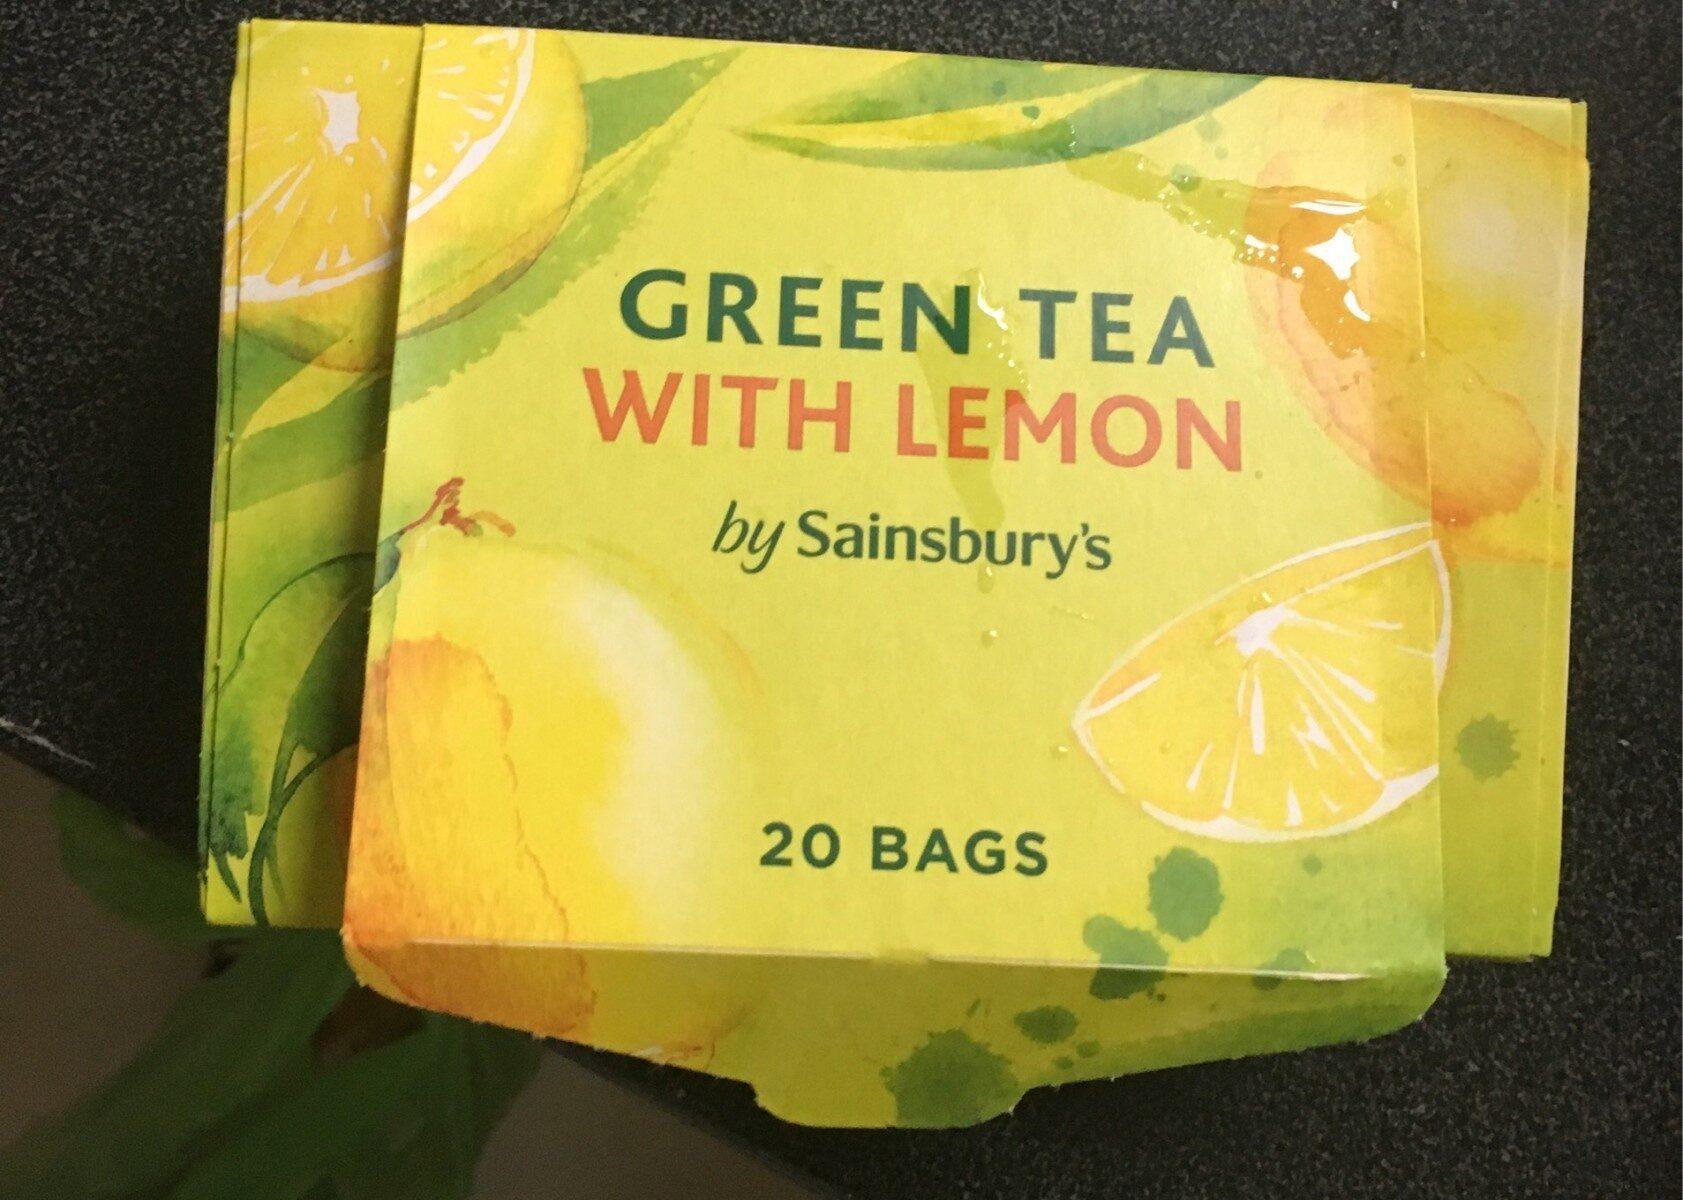 Green Tea With Lemon - Product